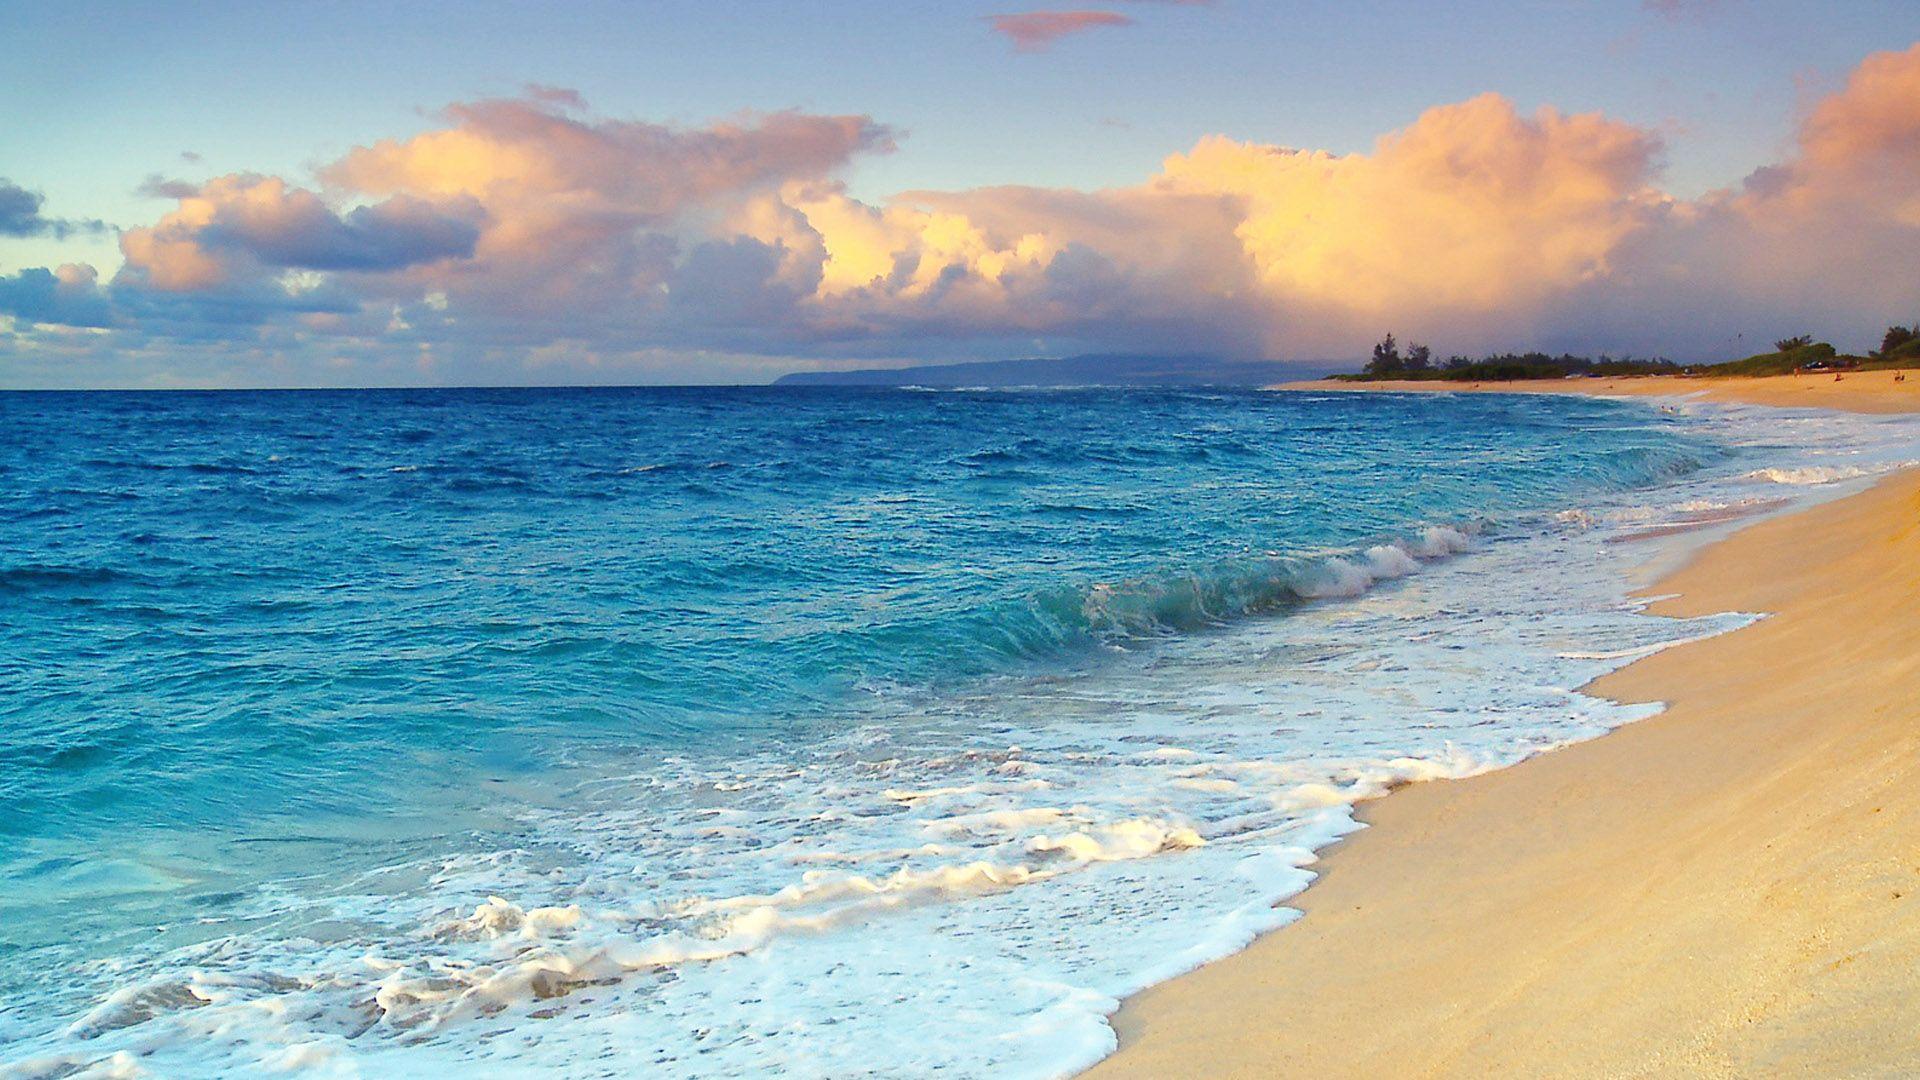 Mac Beach Wallpapers Top Free Mac Beach Backgrounds